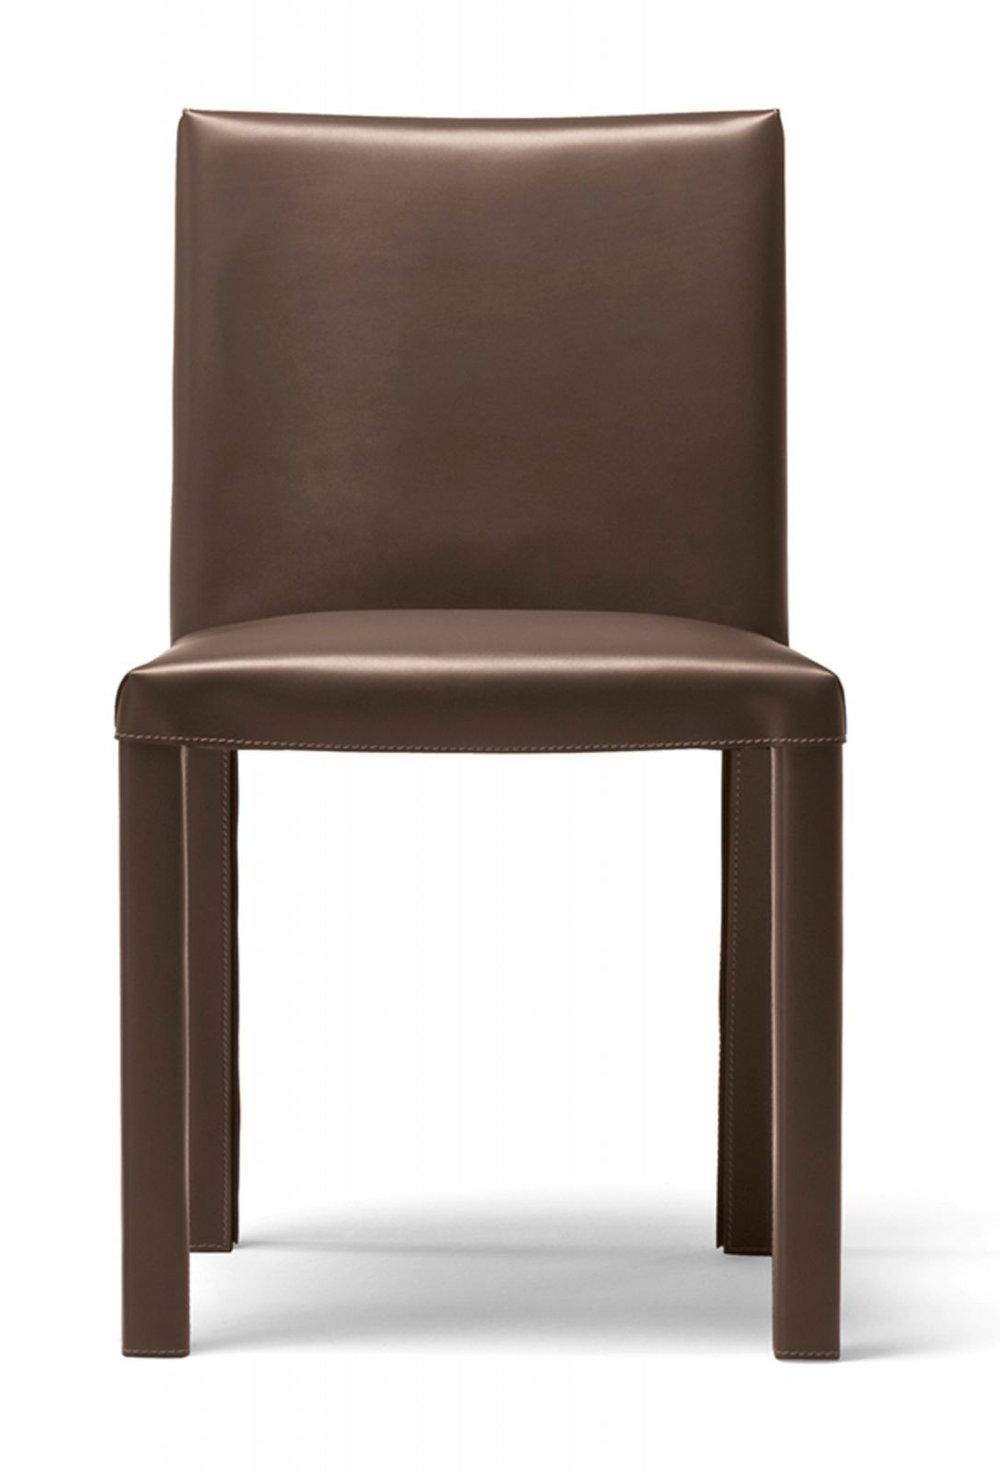 modern-office-furniture-chairs-Italian-designer-furniture (37).jpg